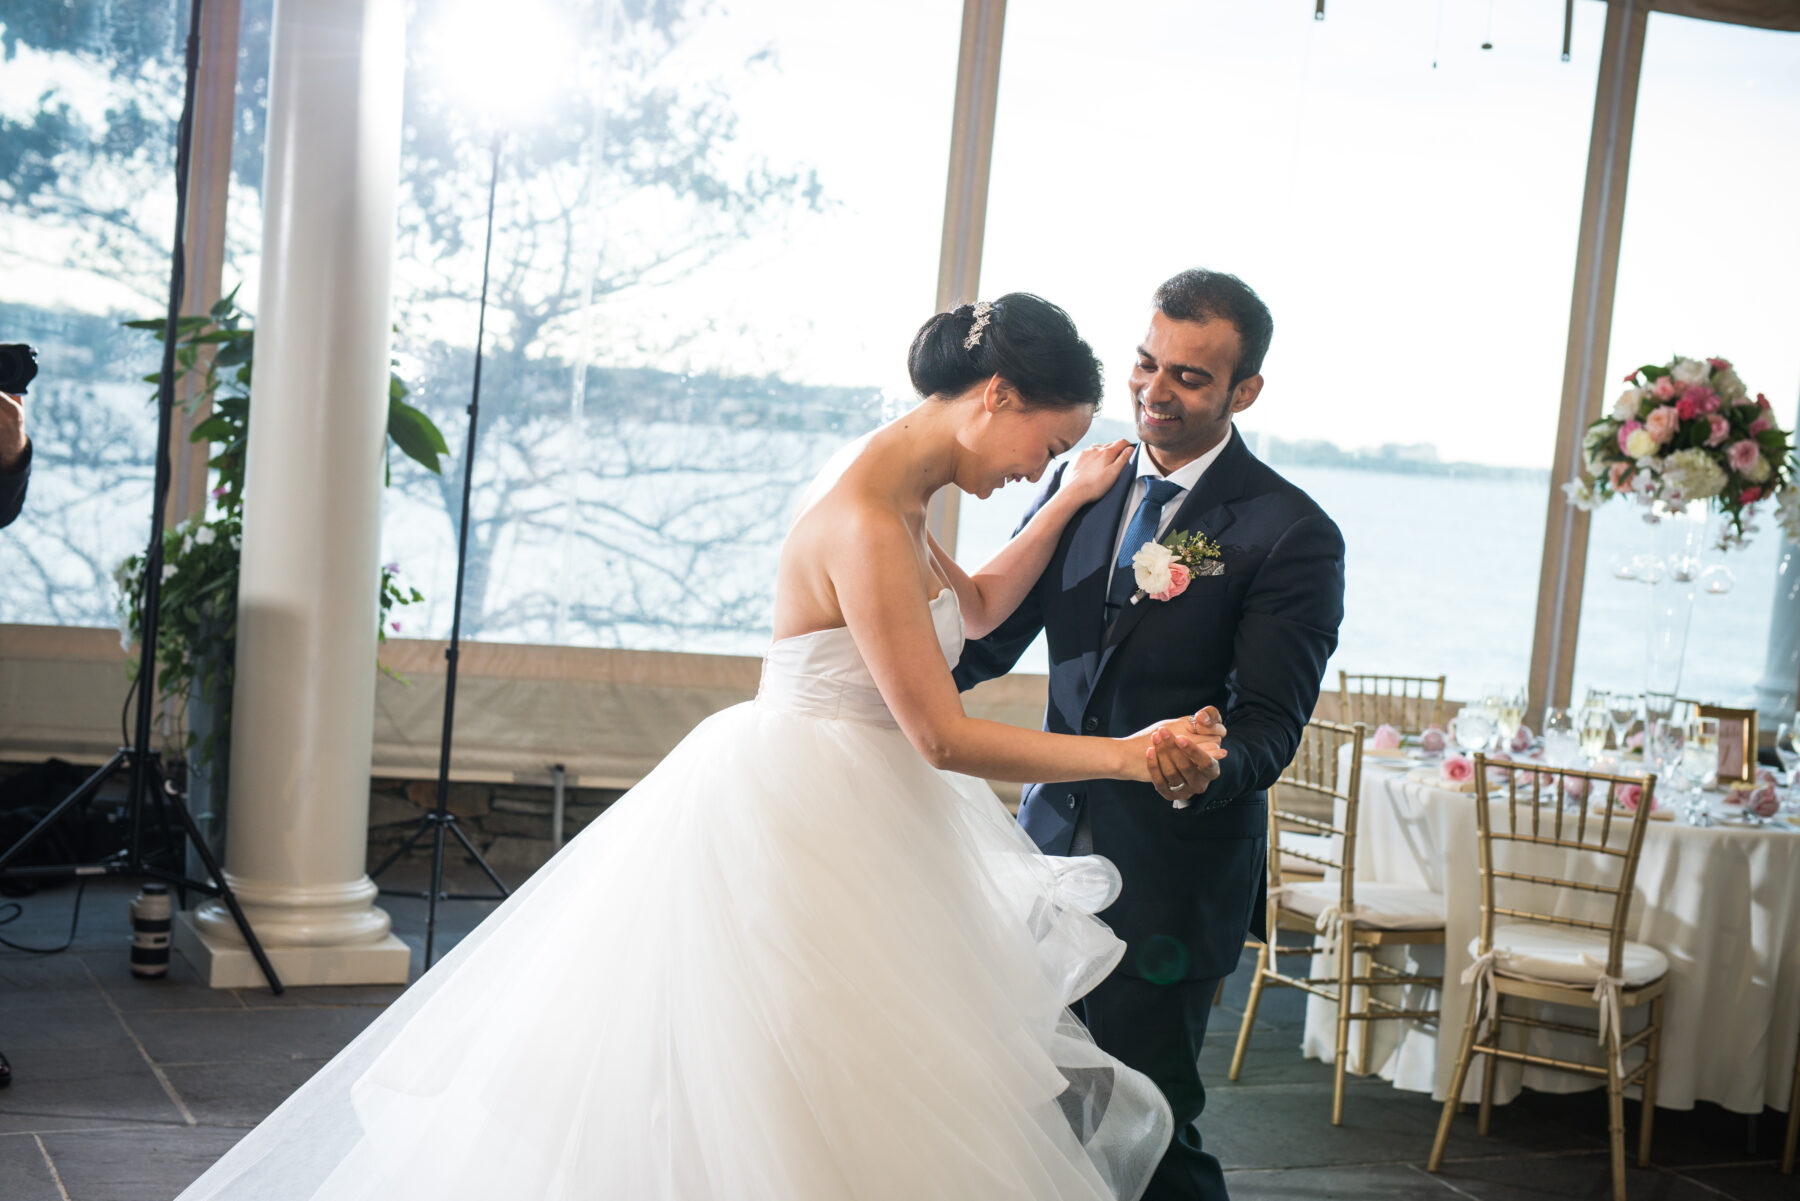 Chanler Newport Wedding Jie and Ahbishek Blueflash Photography 25